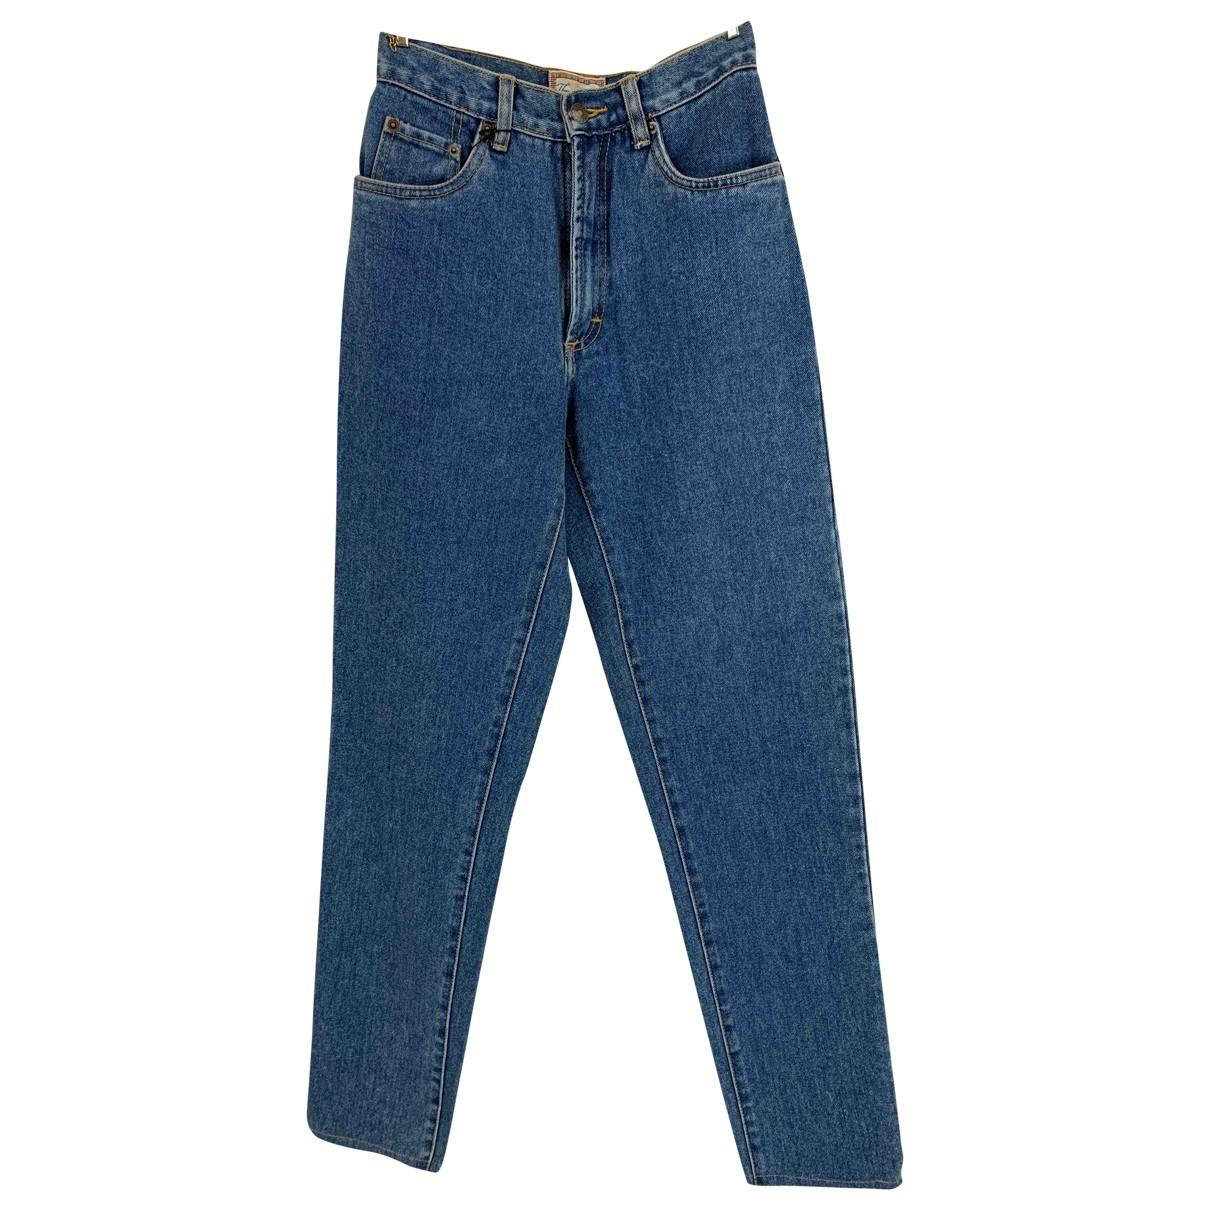 Burberry \N Blue Denim - Jeans Jeans for Women 8 UK